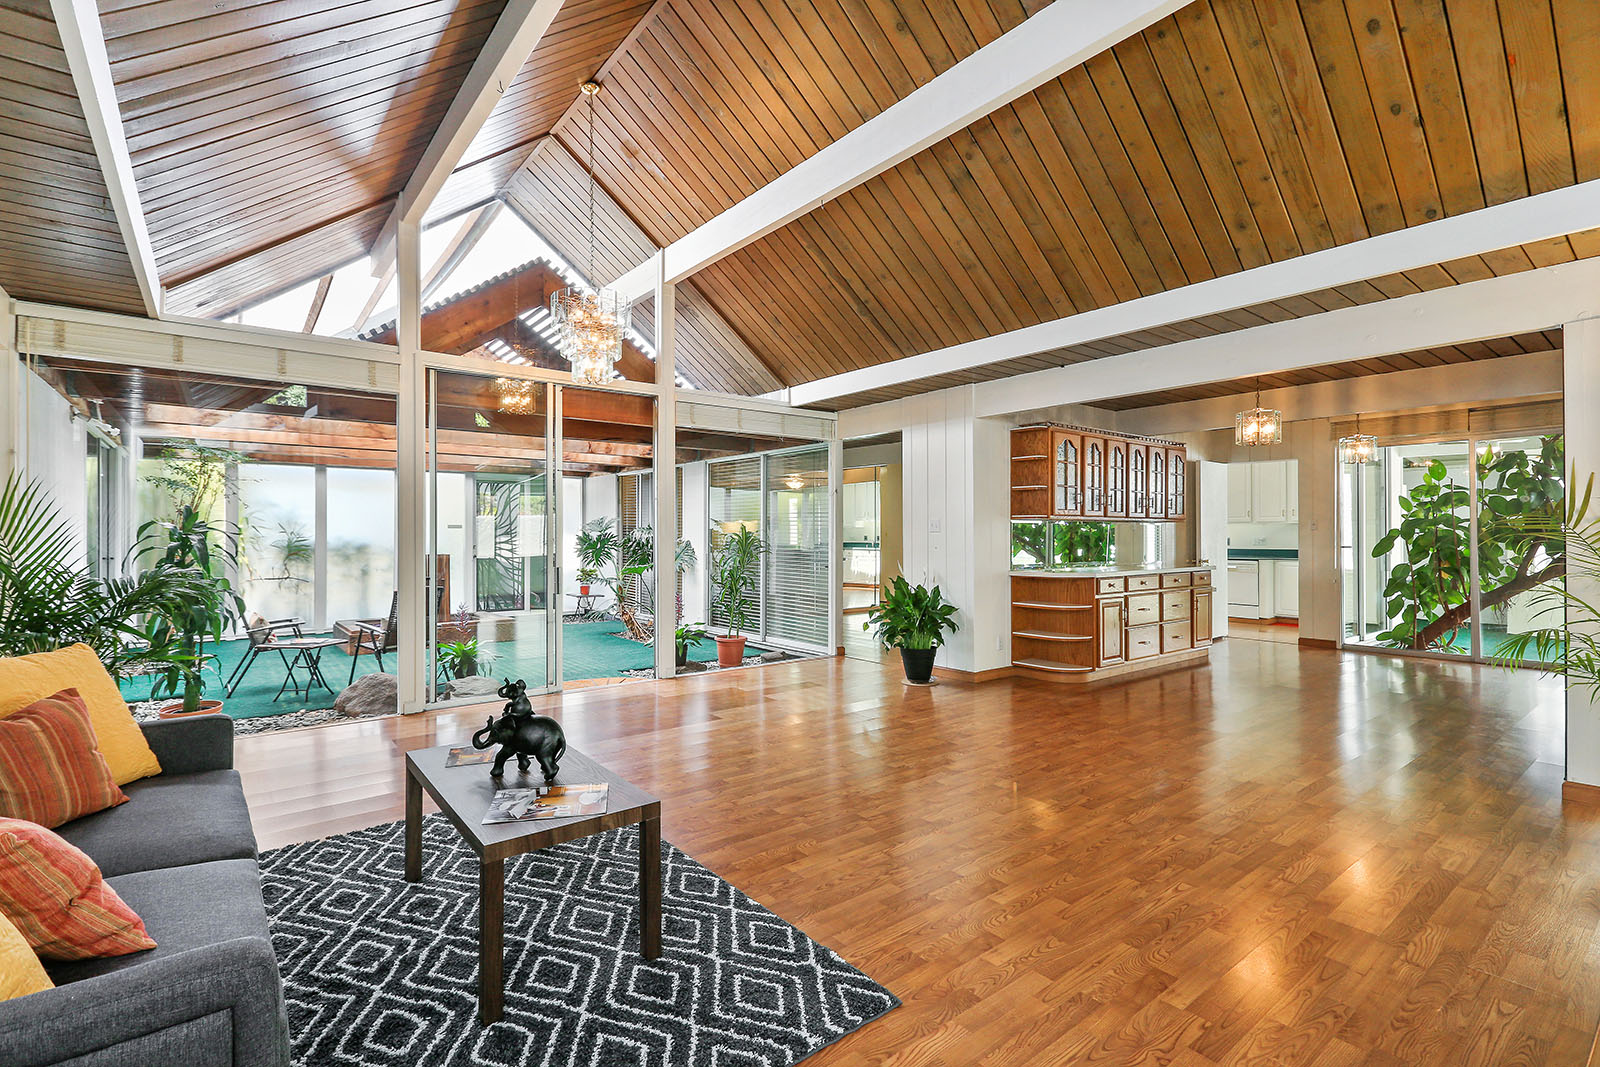 Rare double a frame oakland eichler asks million for Eichler homes for sale bay area